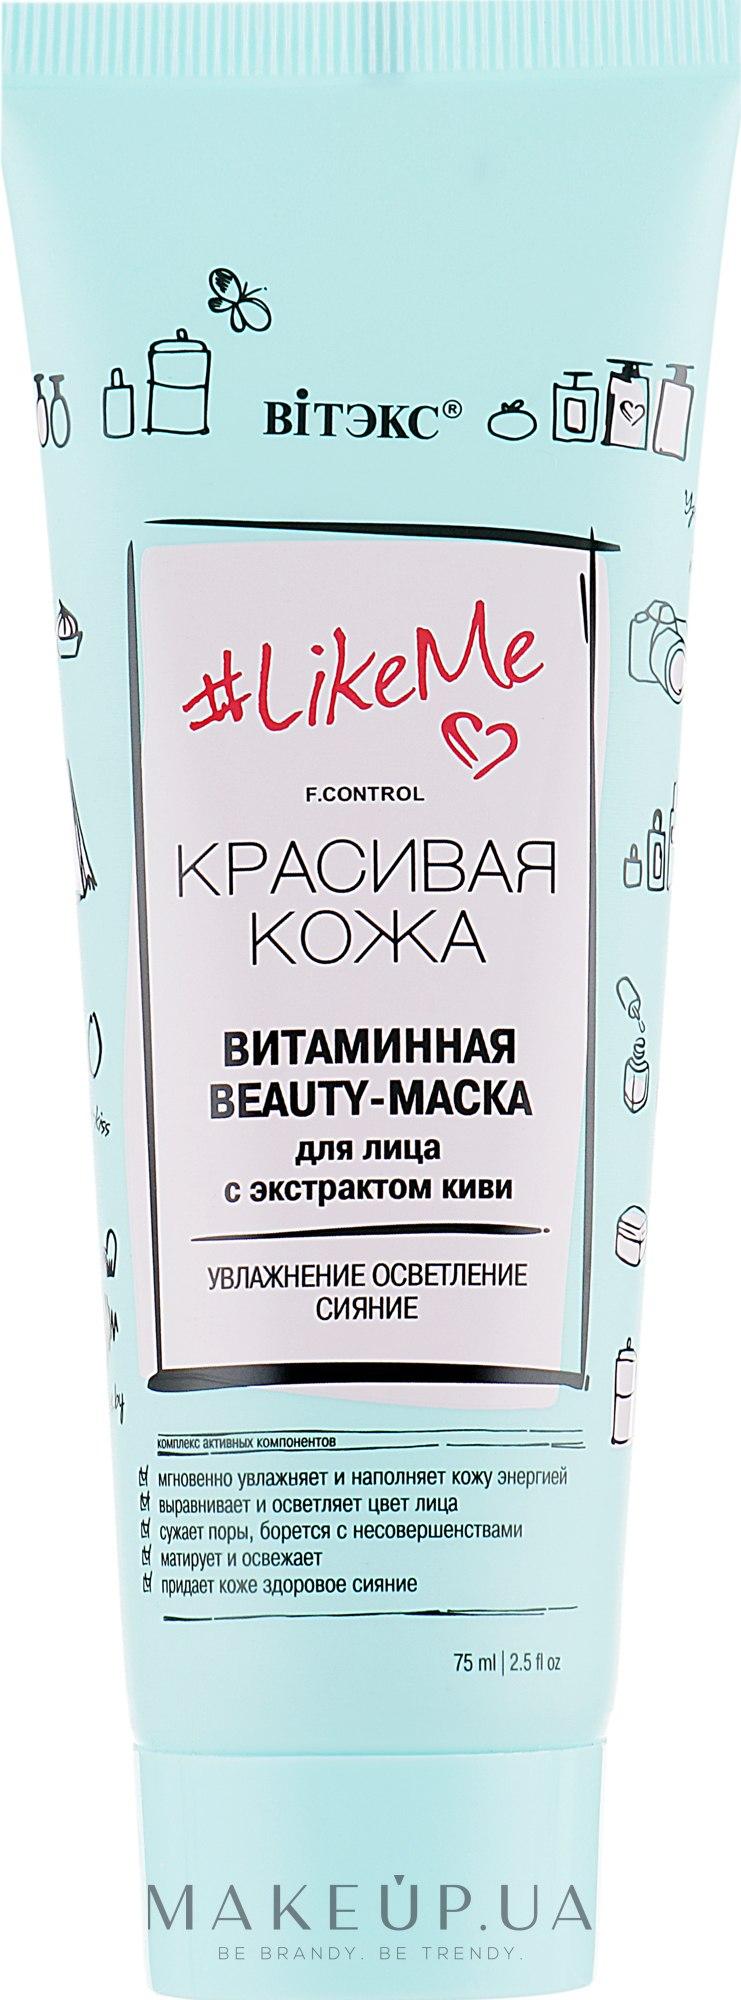 Витаминная Beauty-маска для лица с экстрактом киви - Витэкс LikeMe — фото 75ml